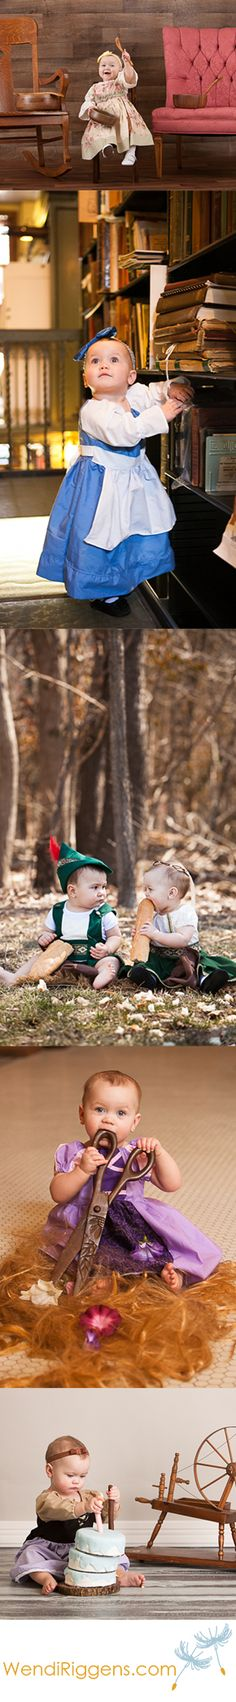 Wendi Riggens Photography Blog - Wedding Senior Newborn Photographer - Burlington Iowa